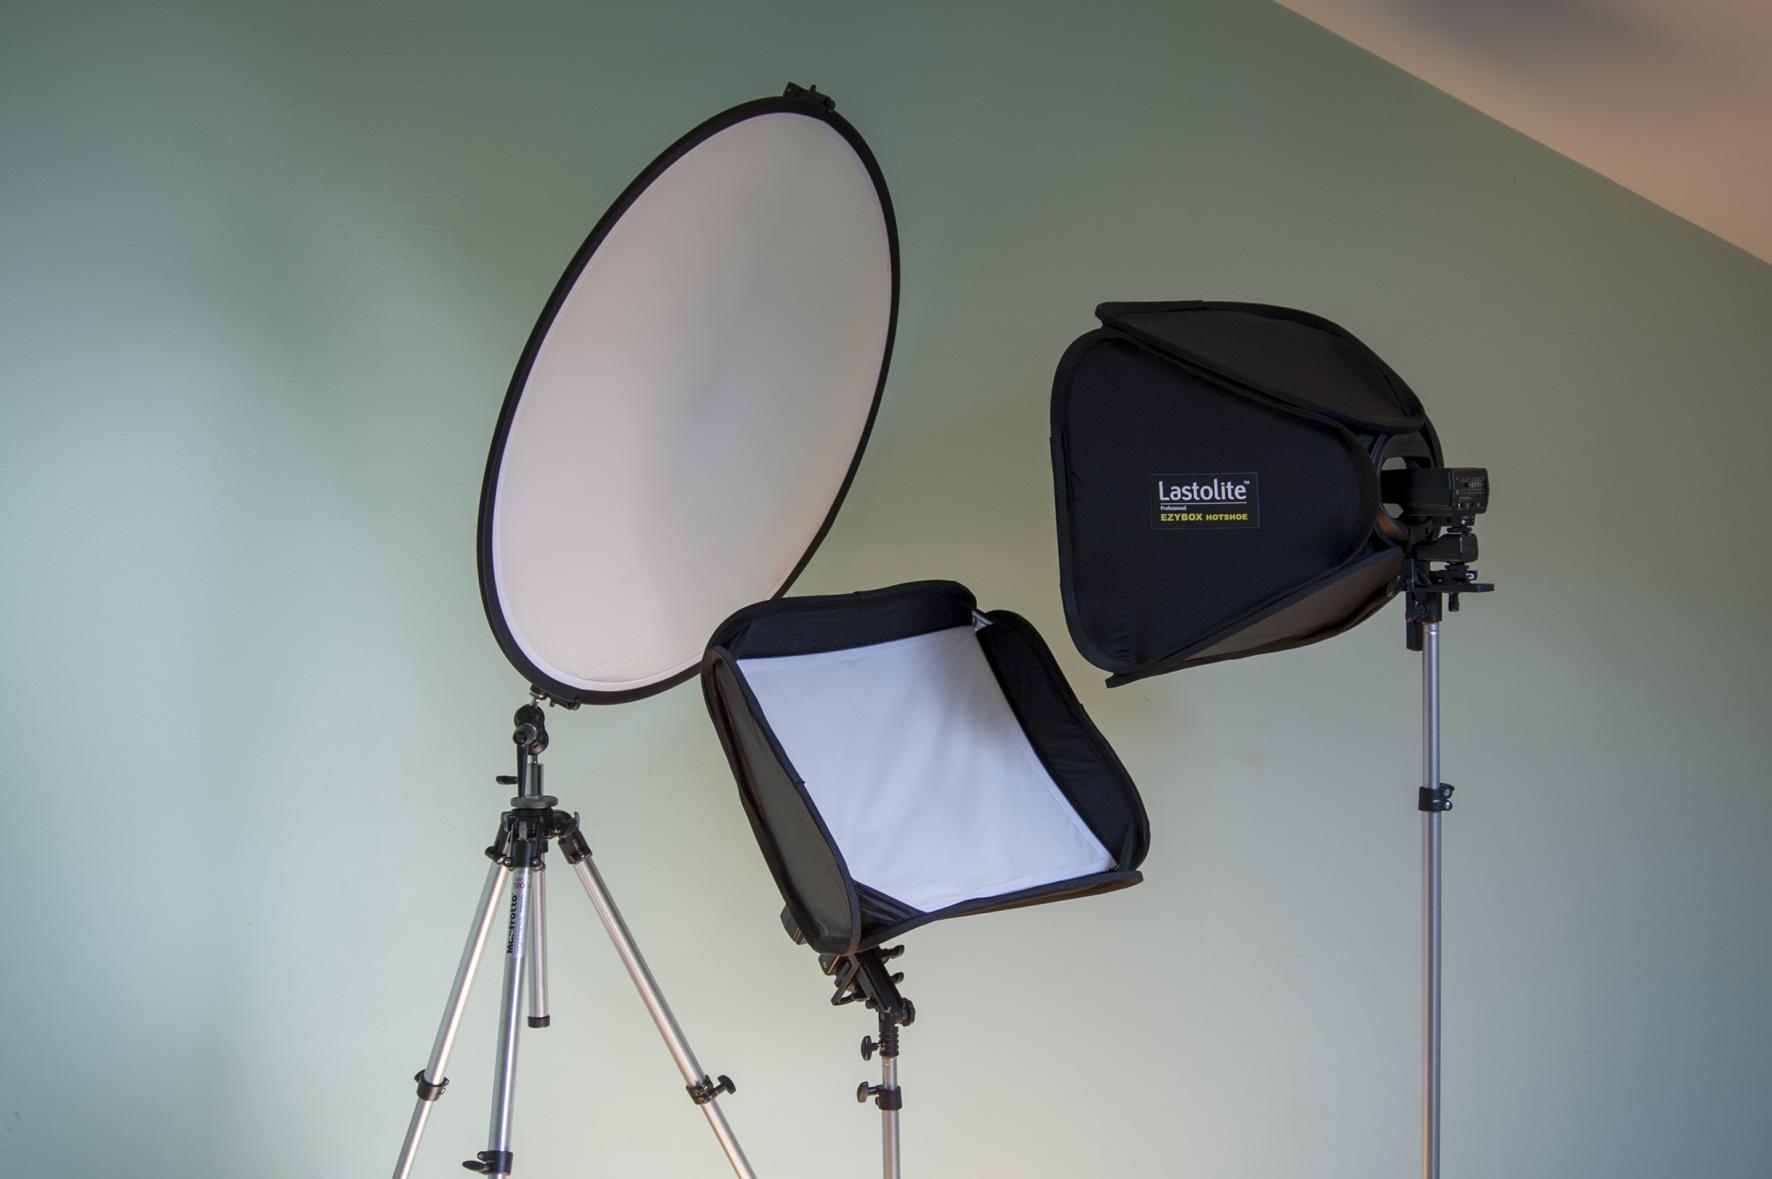 studio pro transportable lumi re naturelle clairage continu flash christian rohn. Black Bedroom Furniture Sets. Home Design Ideas